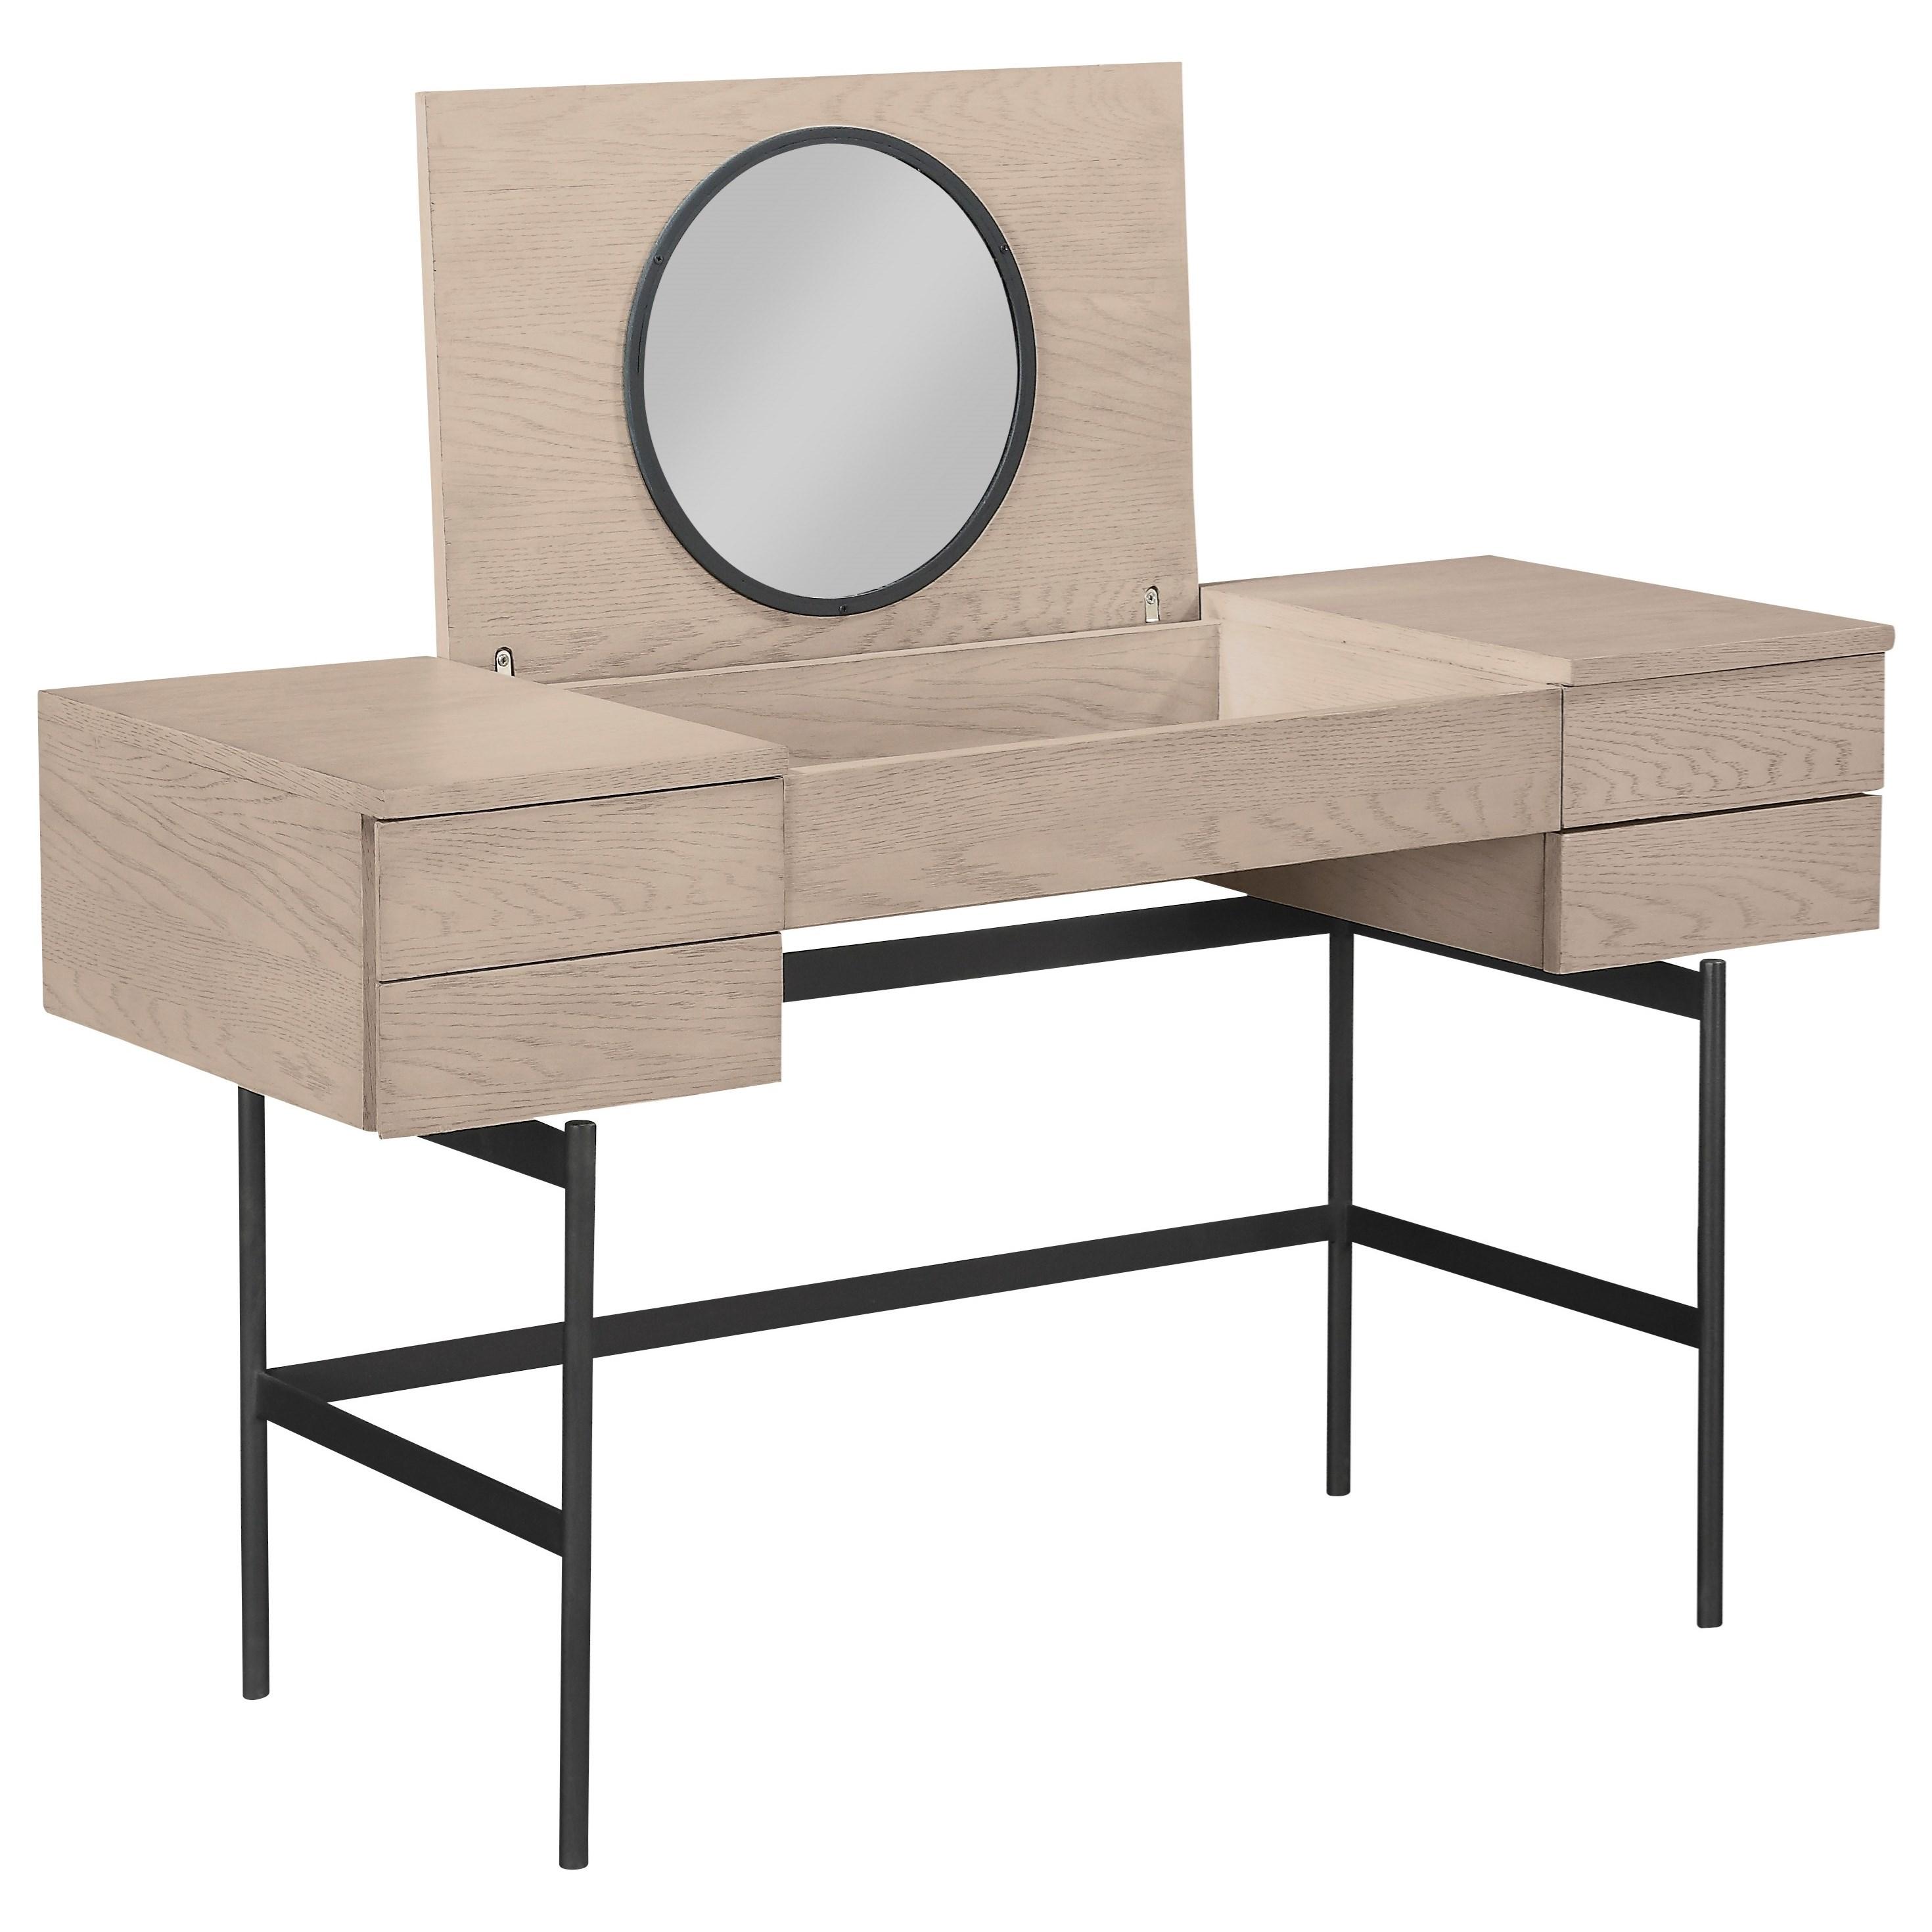 A R T Furniture Inc Bobby Berk Mid Century Modern Anja Vanity Desk With Flip Up Mirror Dream Home Interiors Vanities Vanity Sets